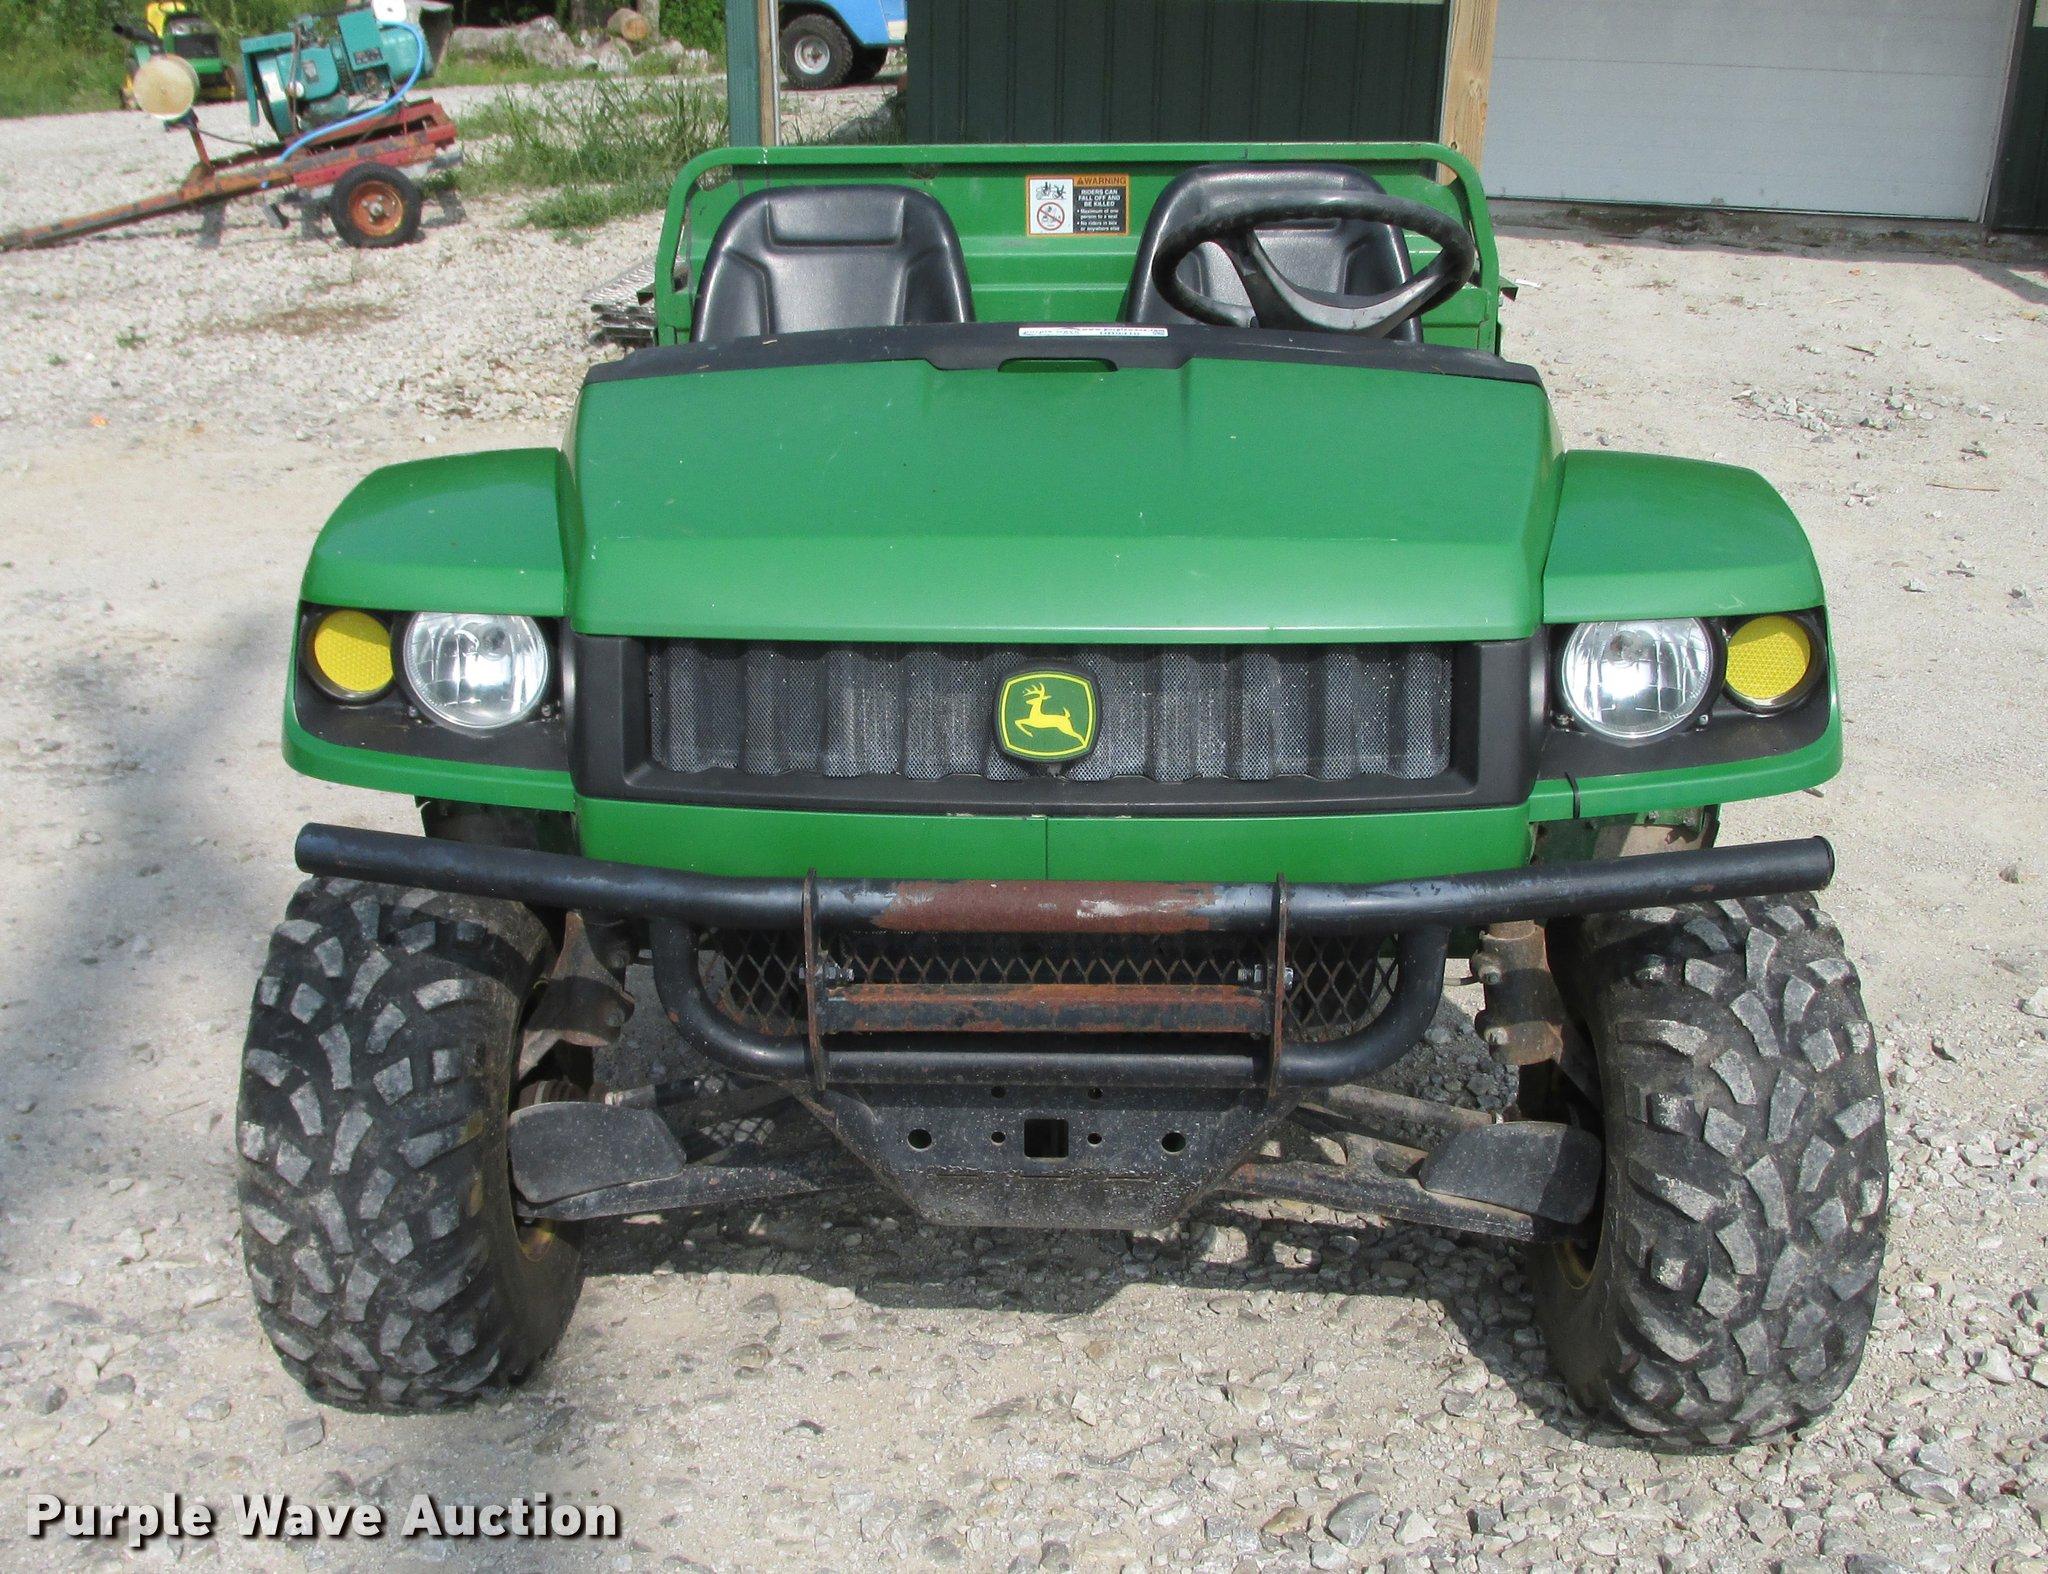 John Deere Gator HPX utility vehicle | Item DB9310 | SOLD! S